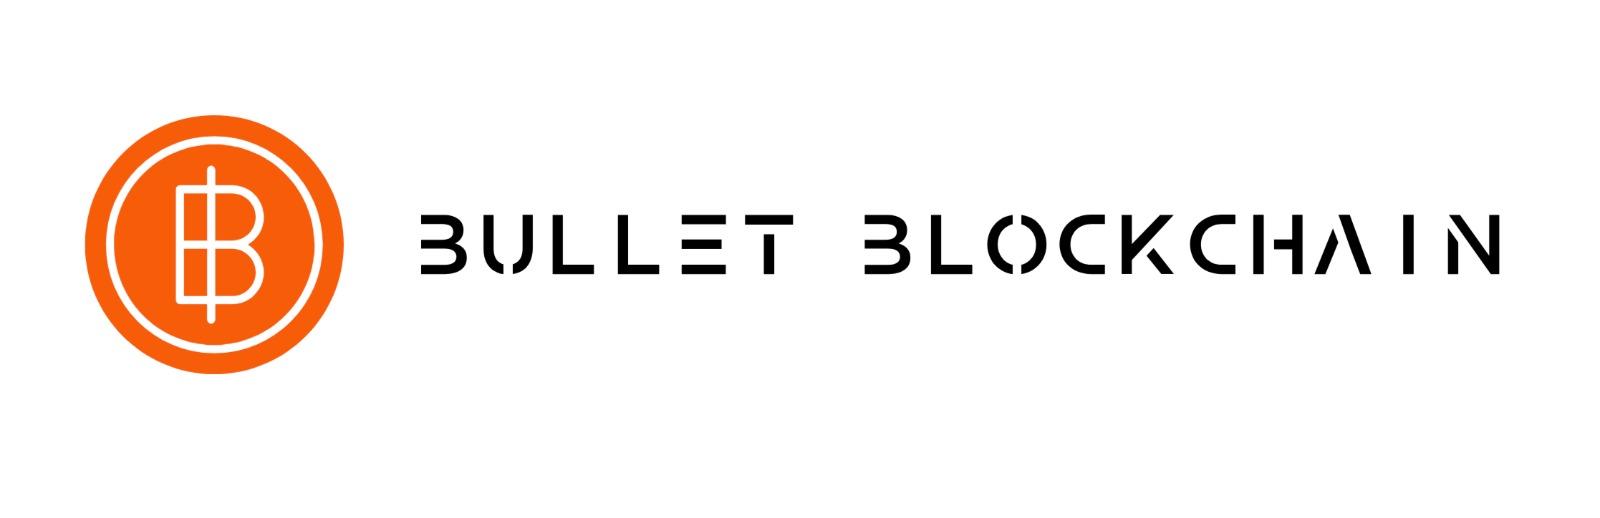 Bullet Blockchain LTD